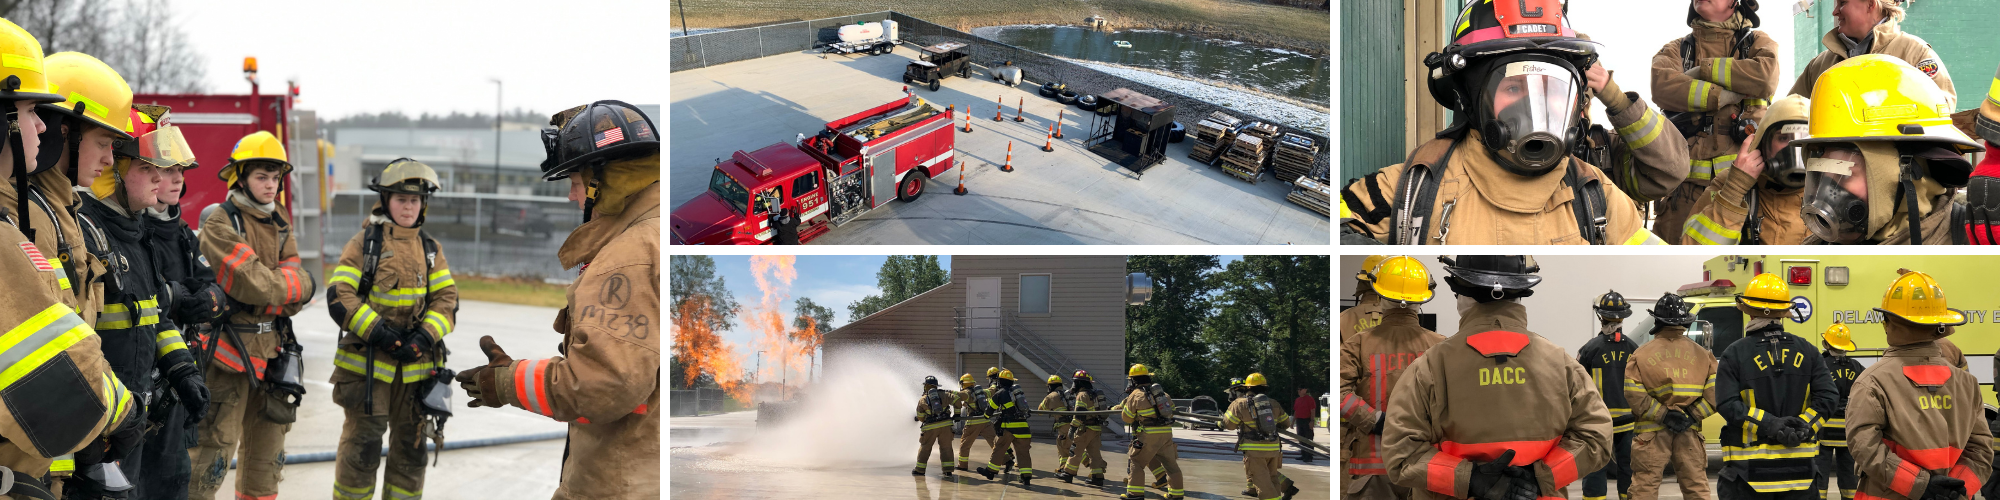 Fire Service Training Program